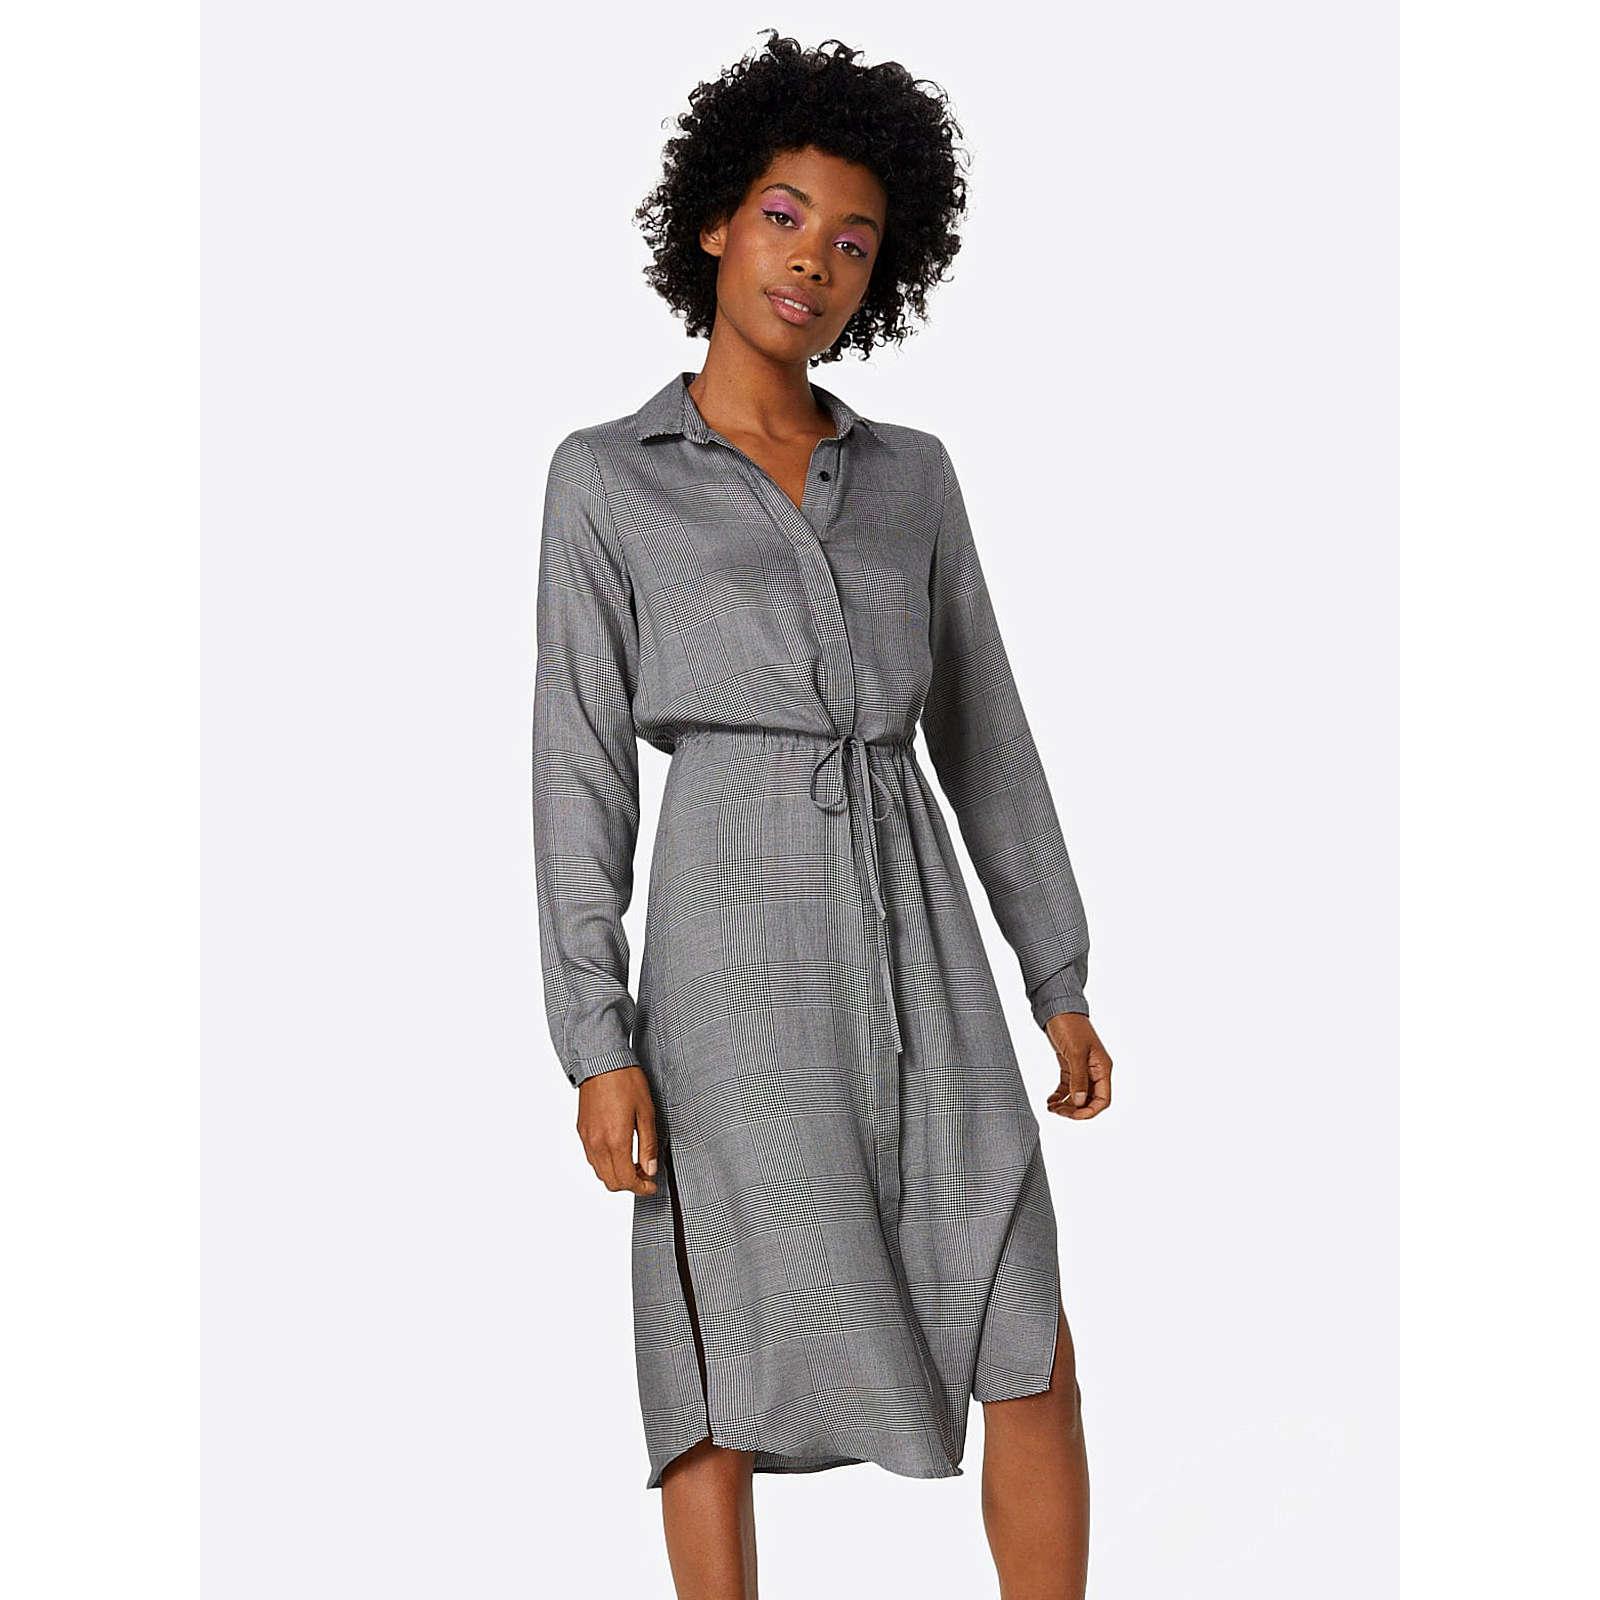 VILA Blusenkleid Blusenkleider grau Damen Gr. 36